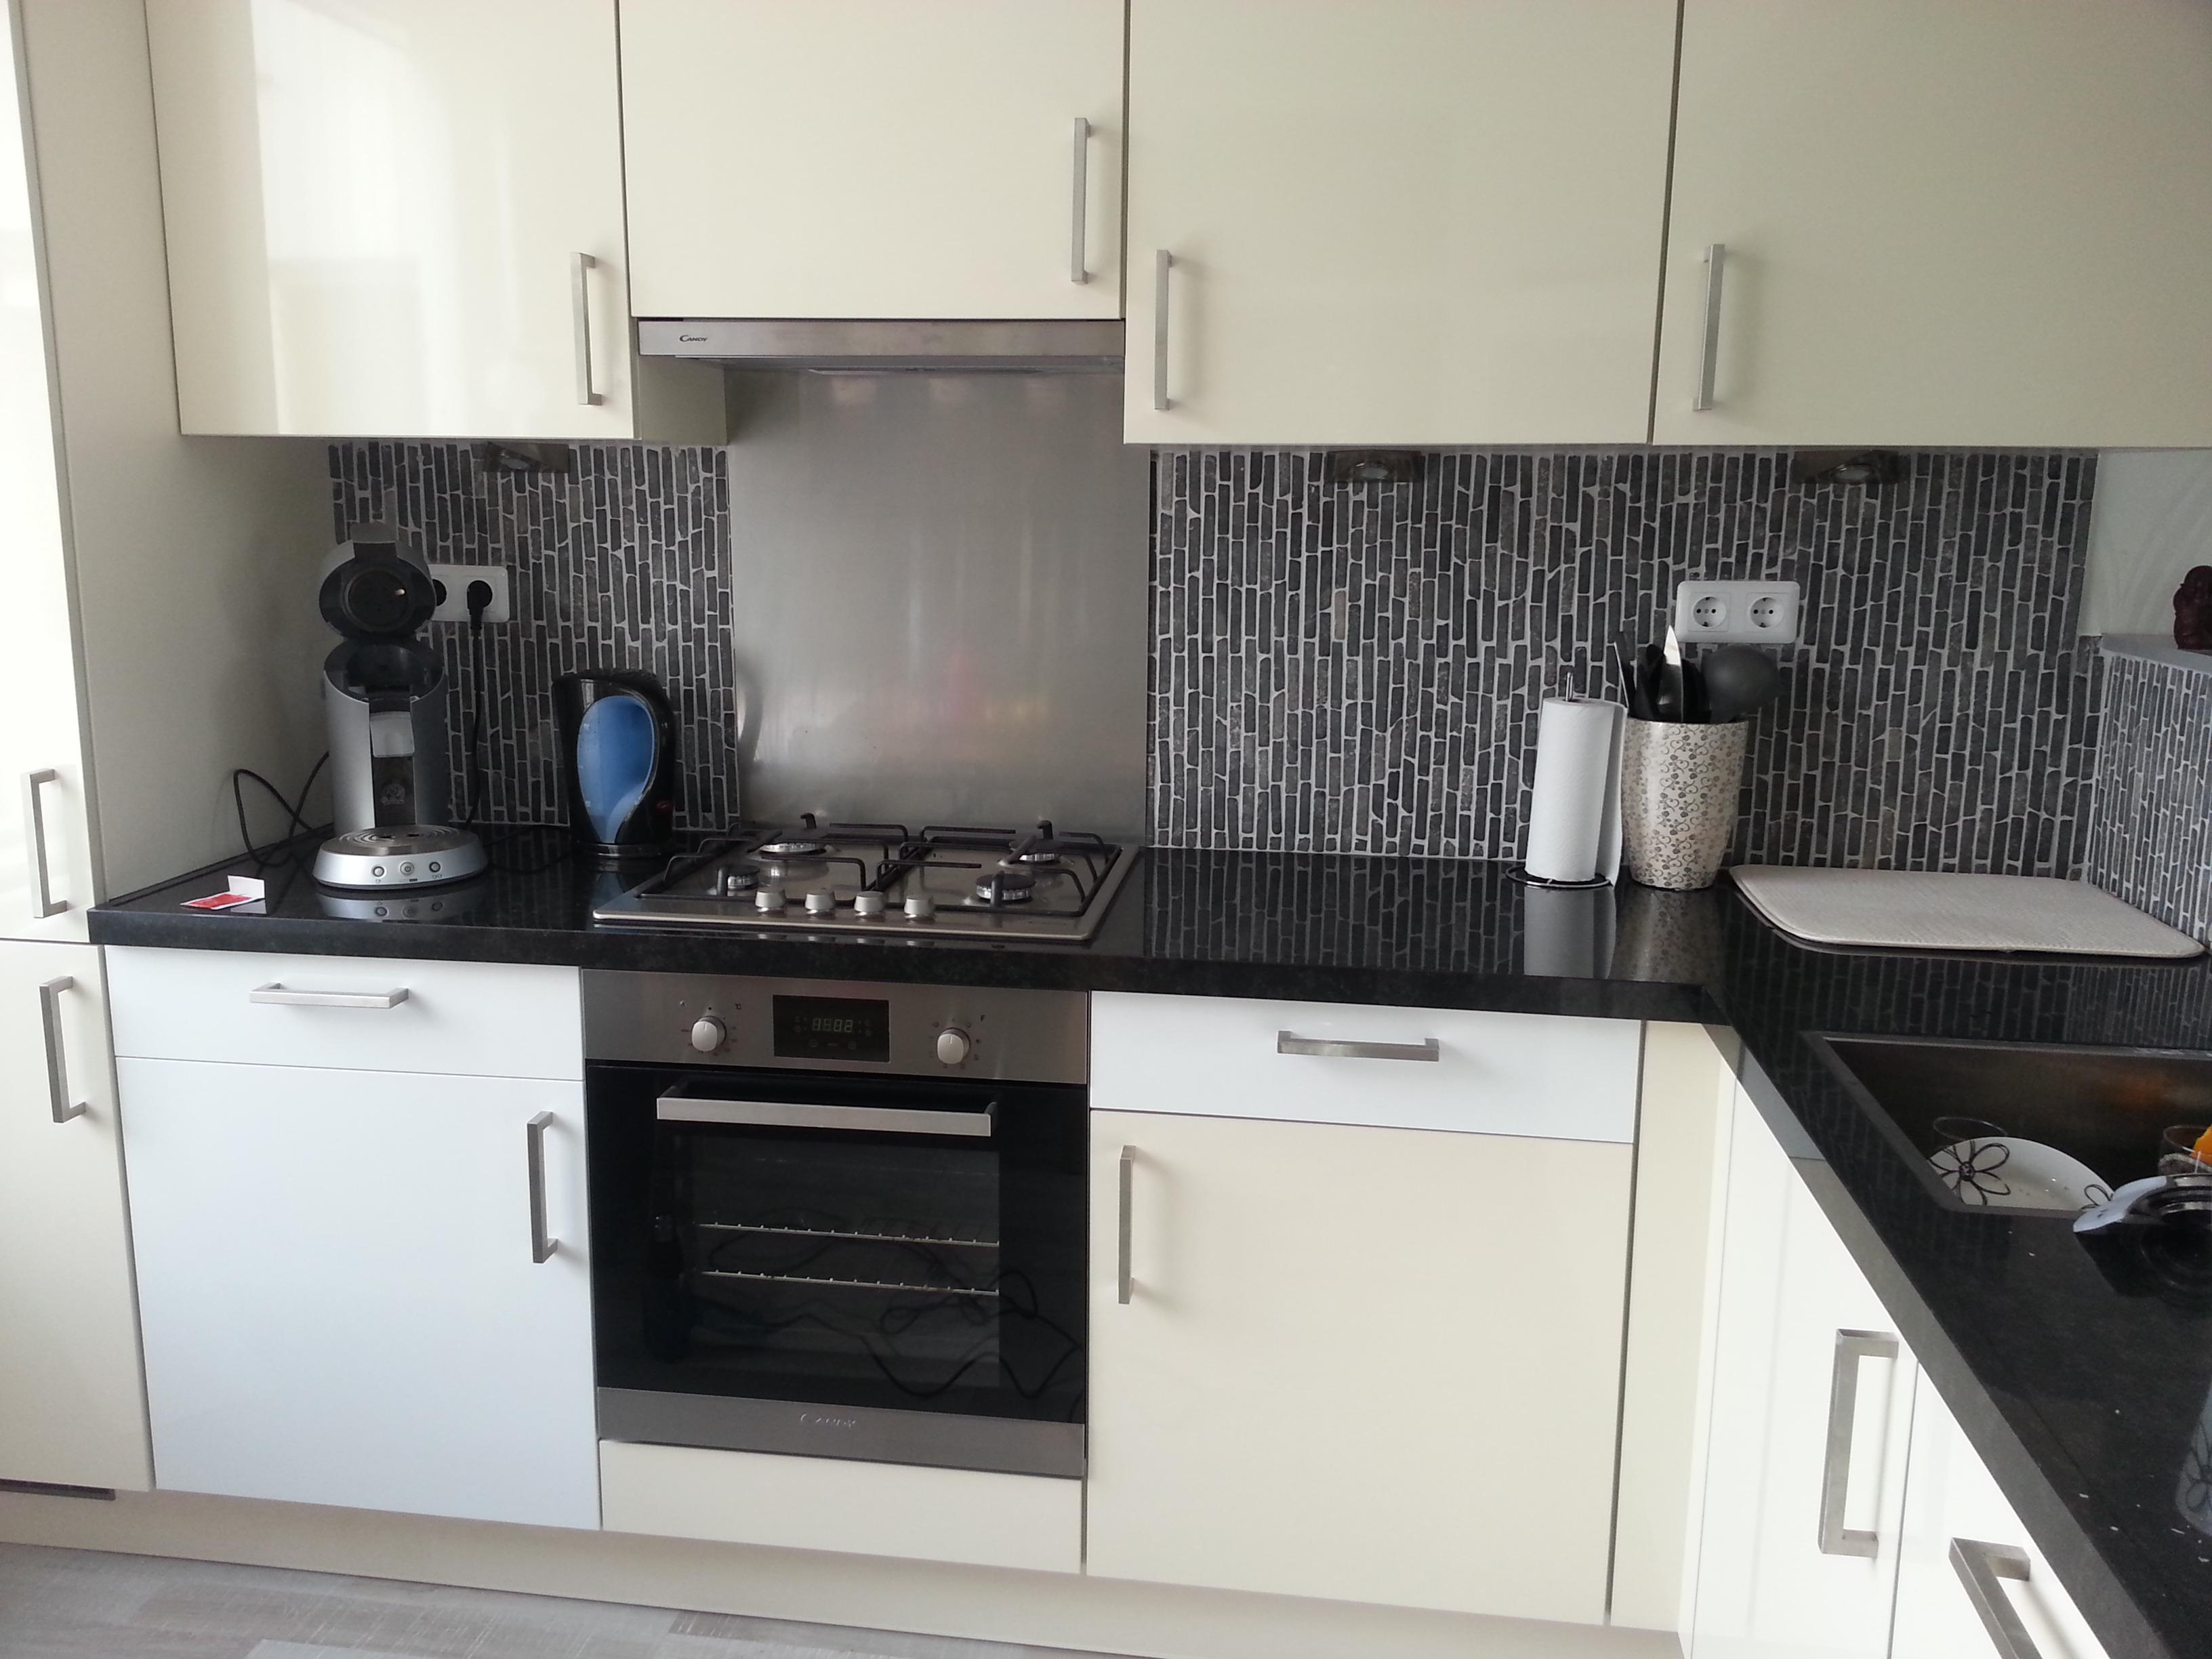 Keuken idee opknappen - Idee deco keuken wit ...